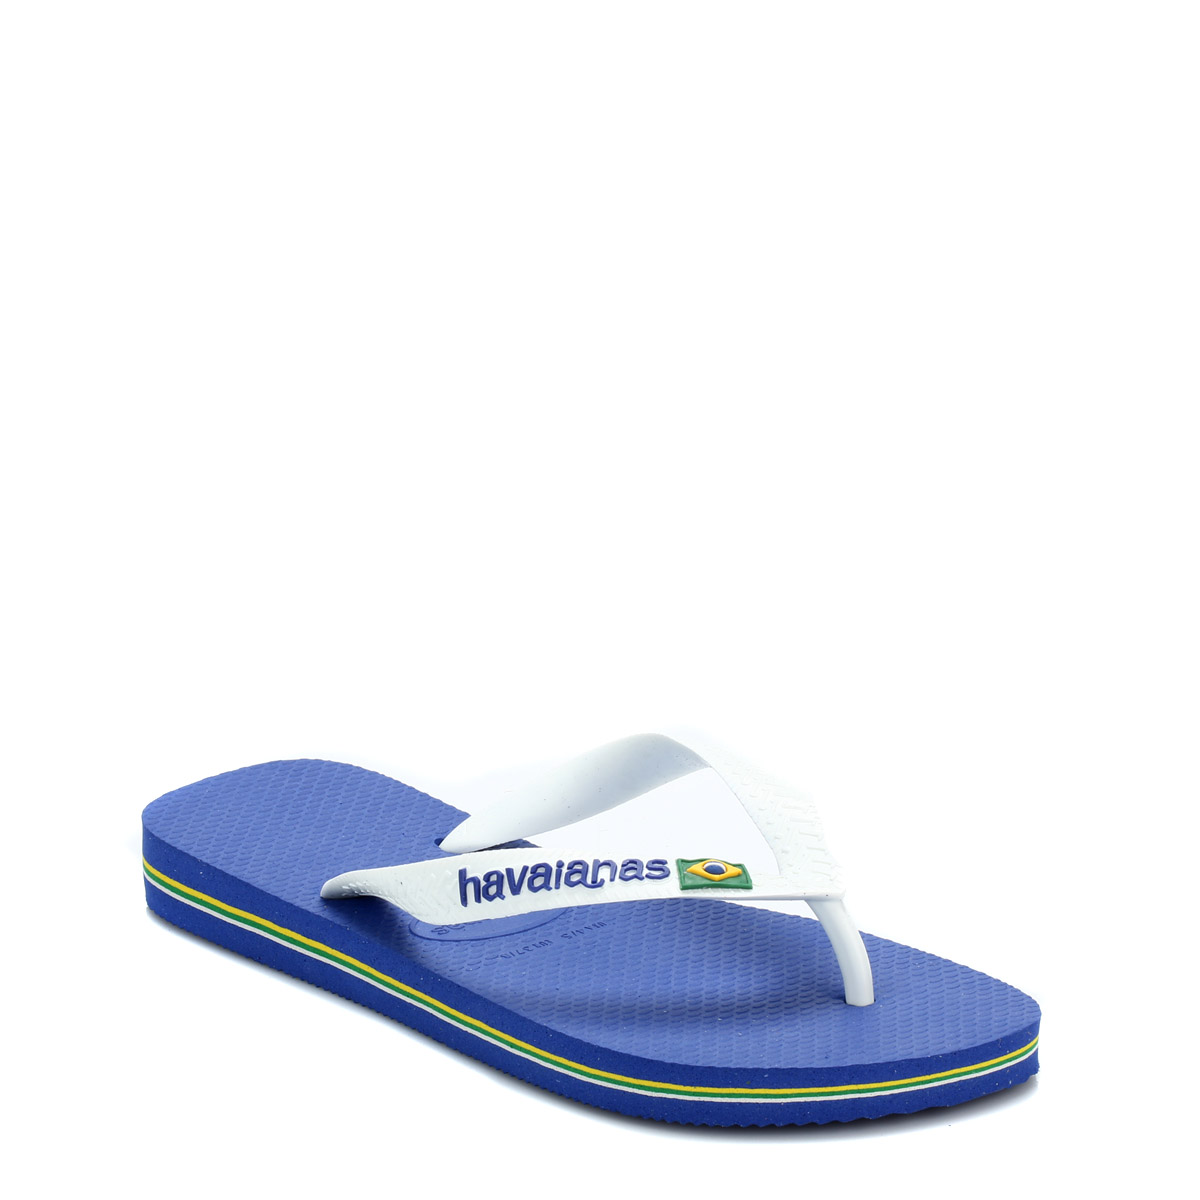 havaianas flip flops toddlers sandals slip on rubber